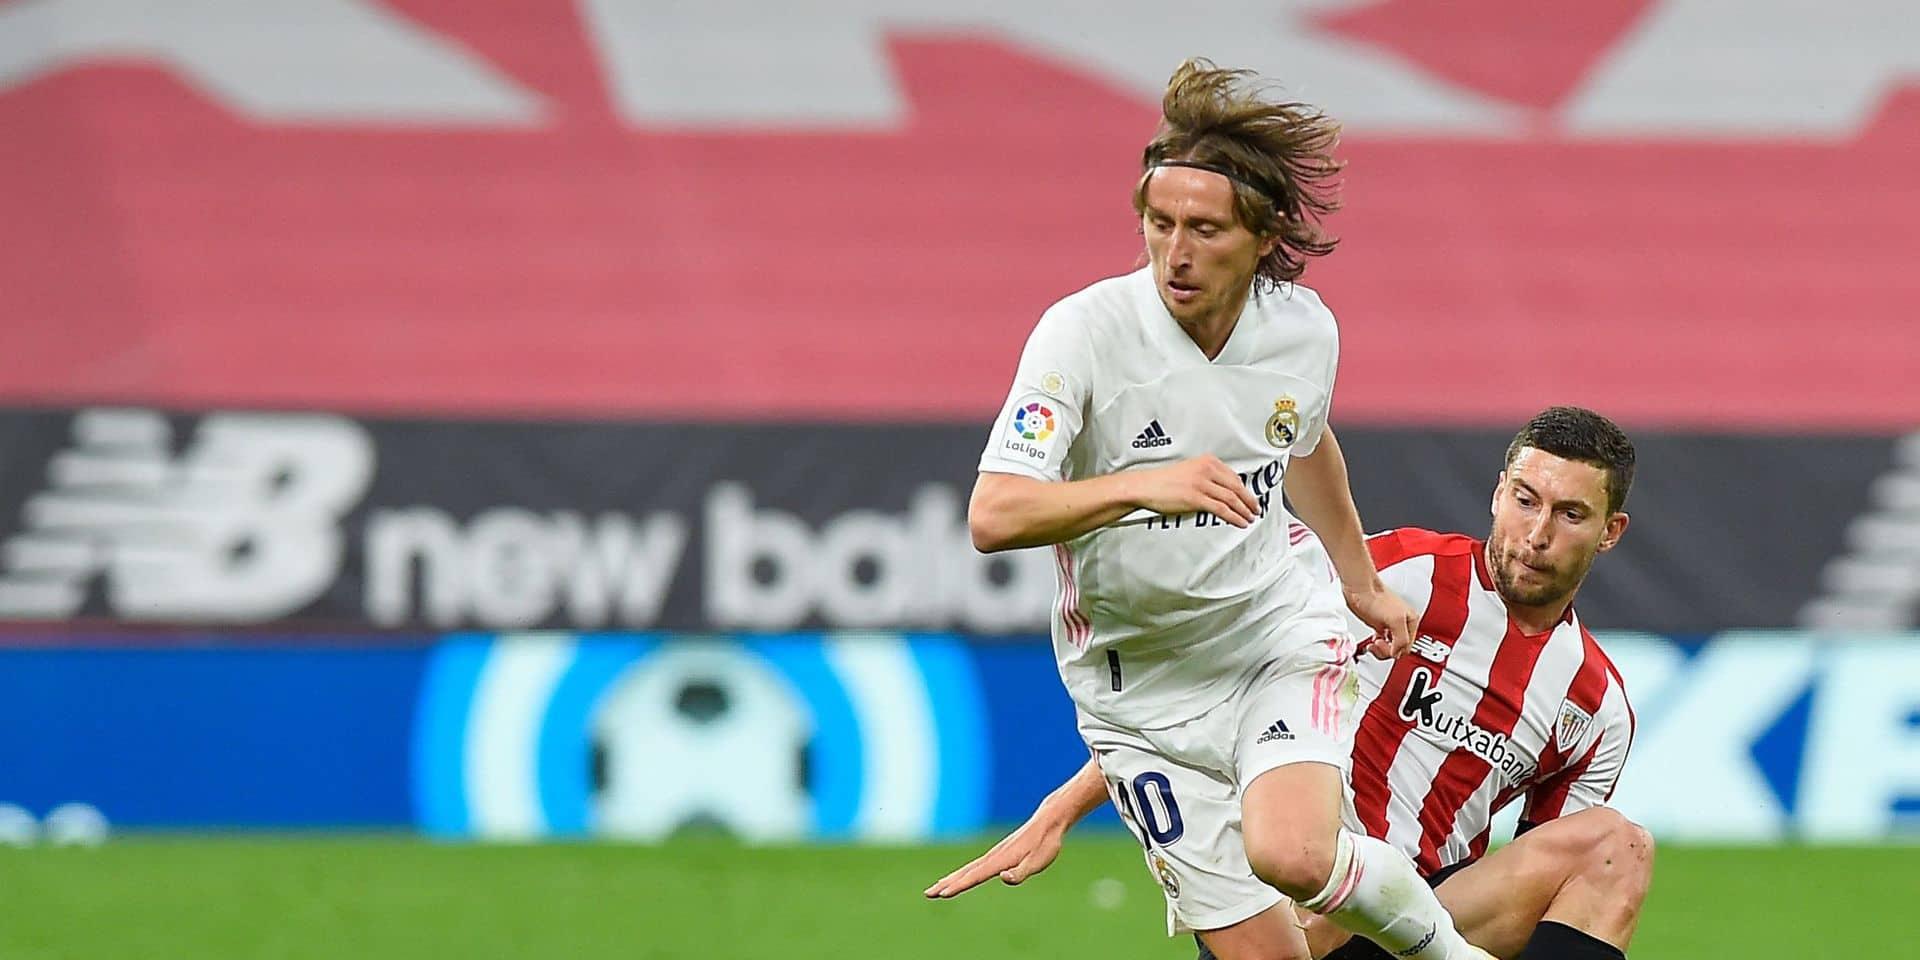 Luka Modric prolonge au Real jusqu'en 2022